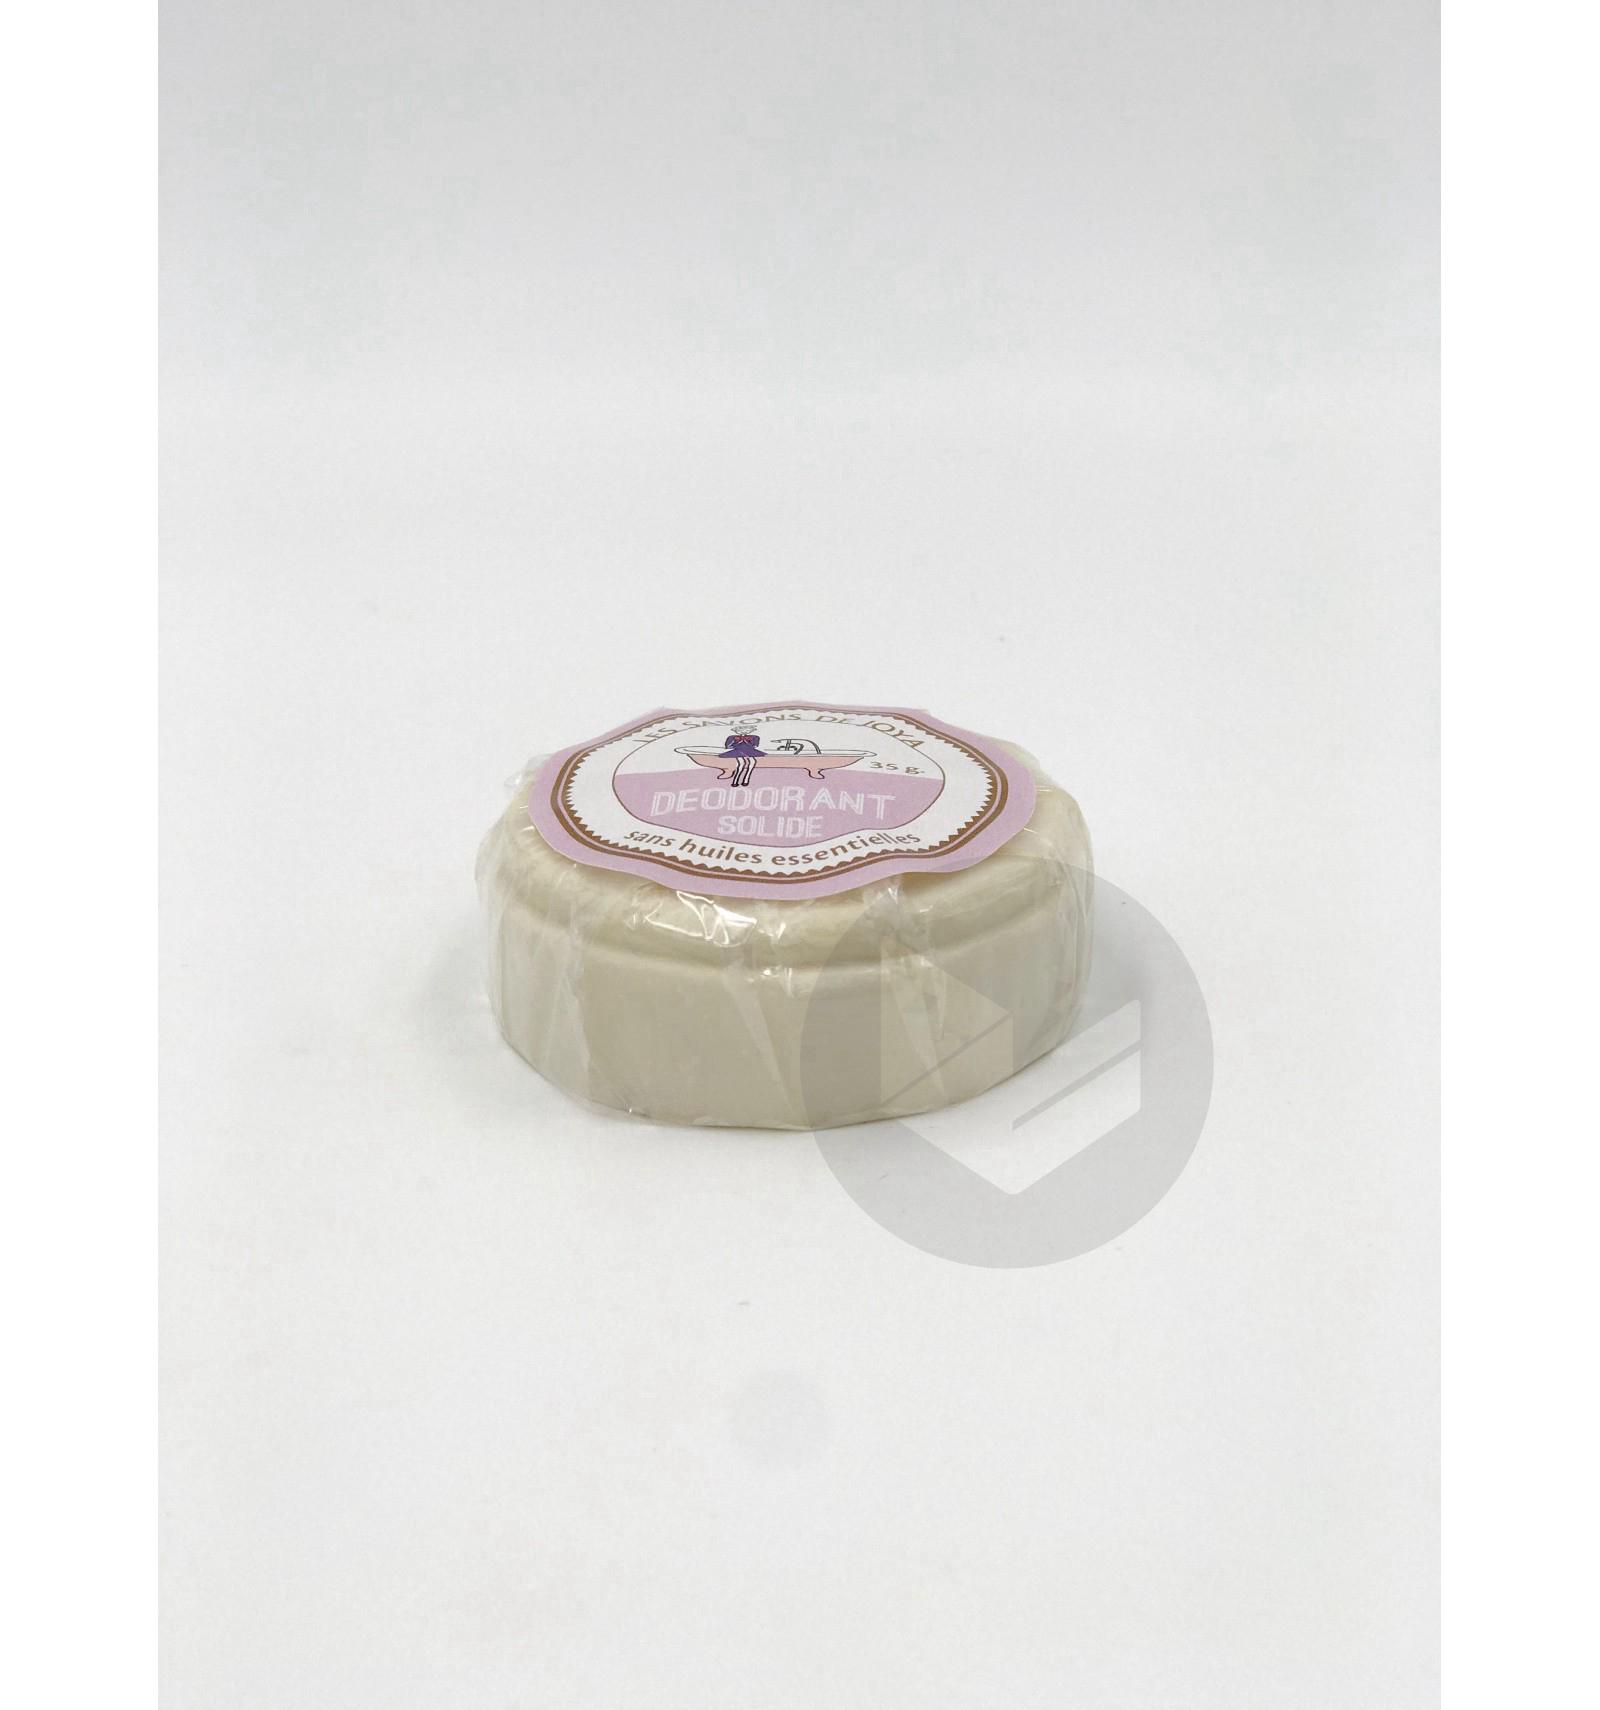 Recharge Deodorant Sans Huile Essentielle